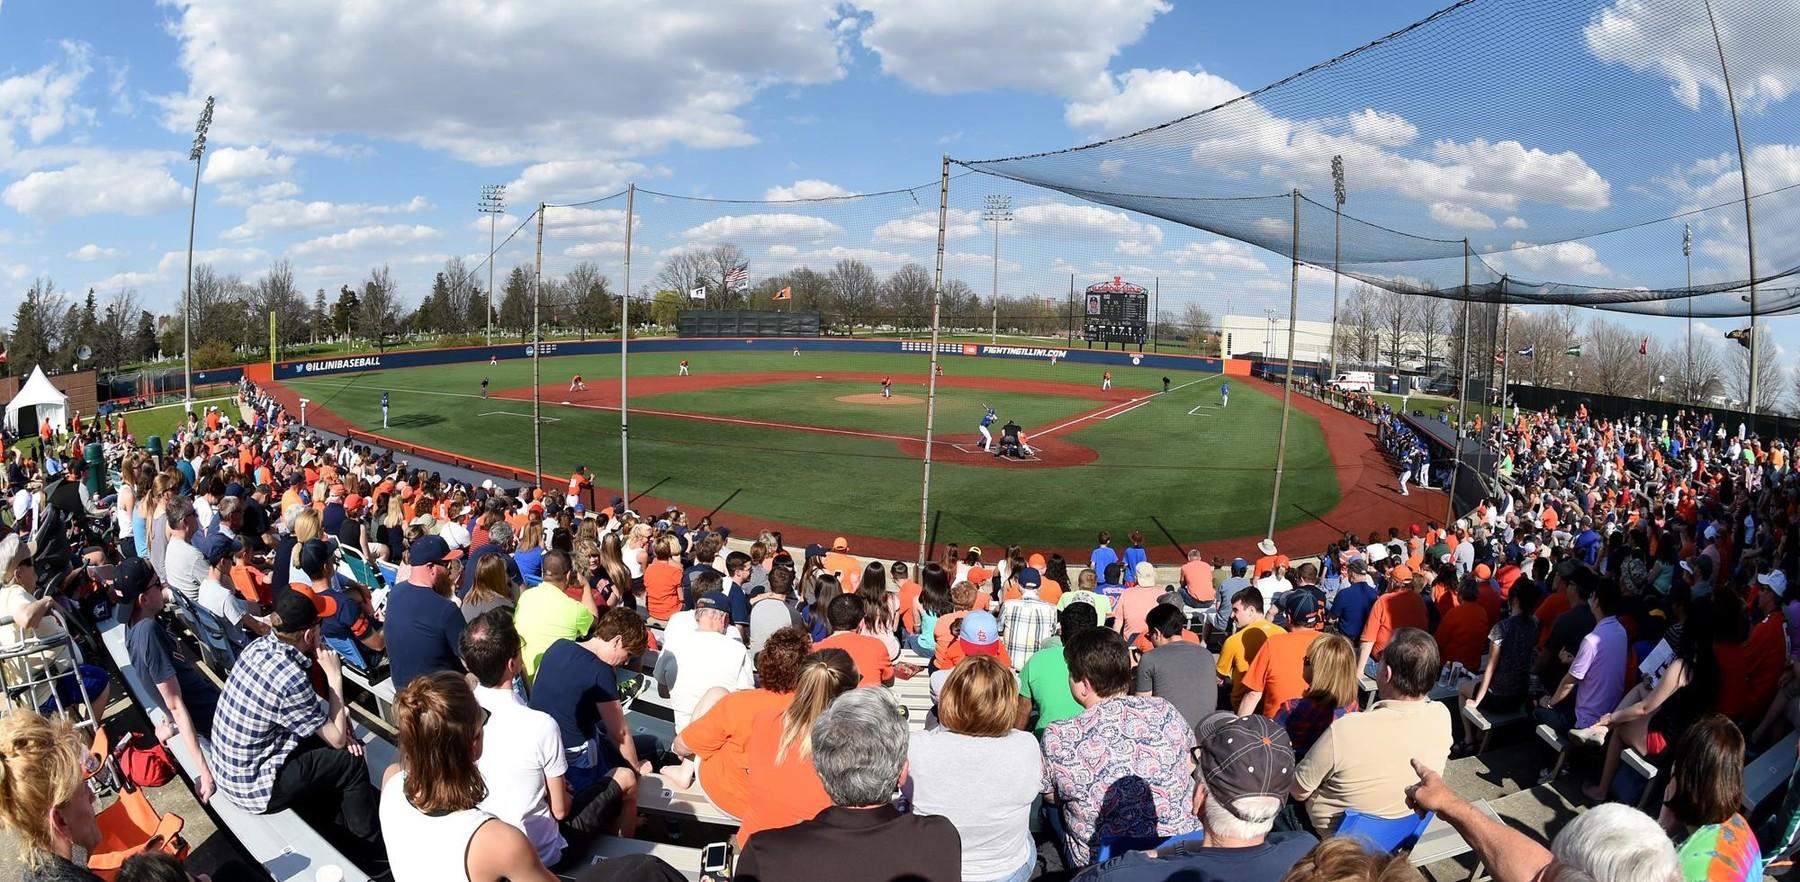 crowd awaits baseball at Illini Field